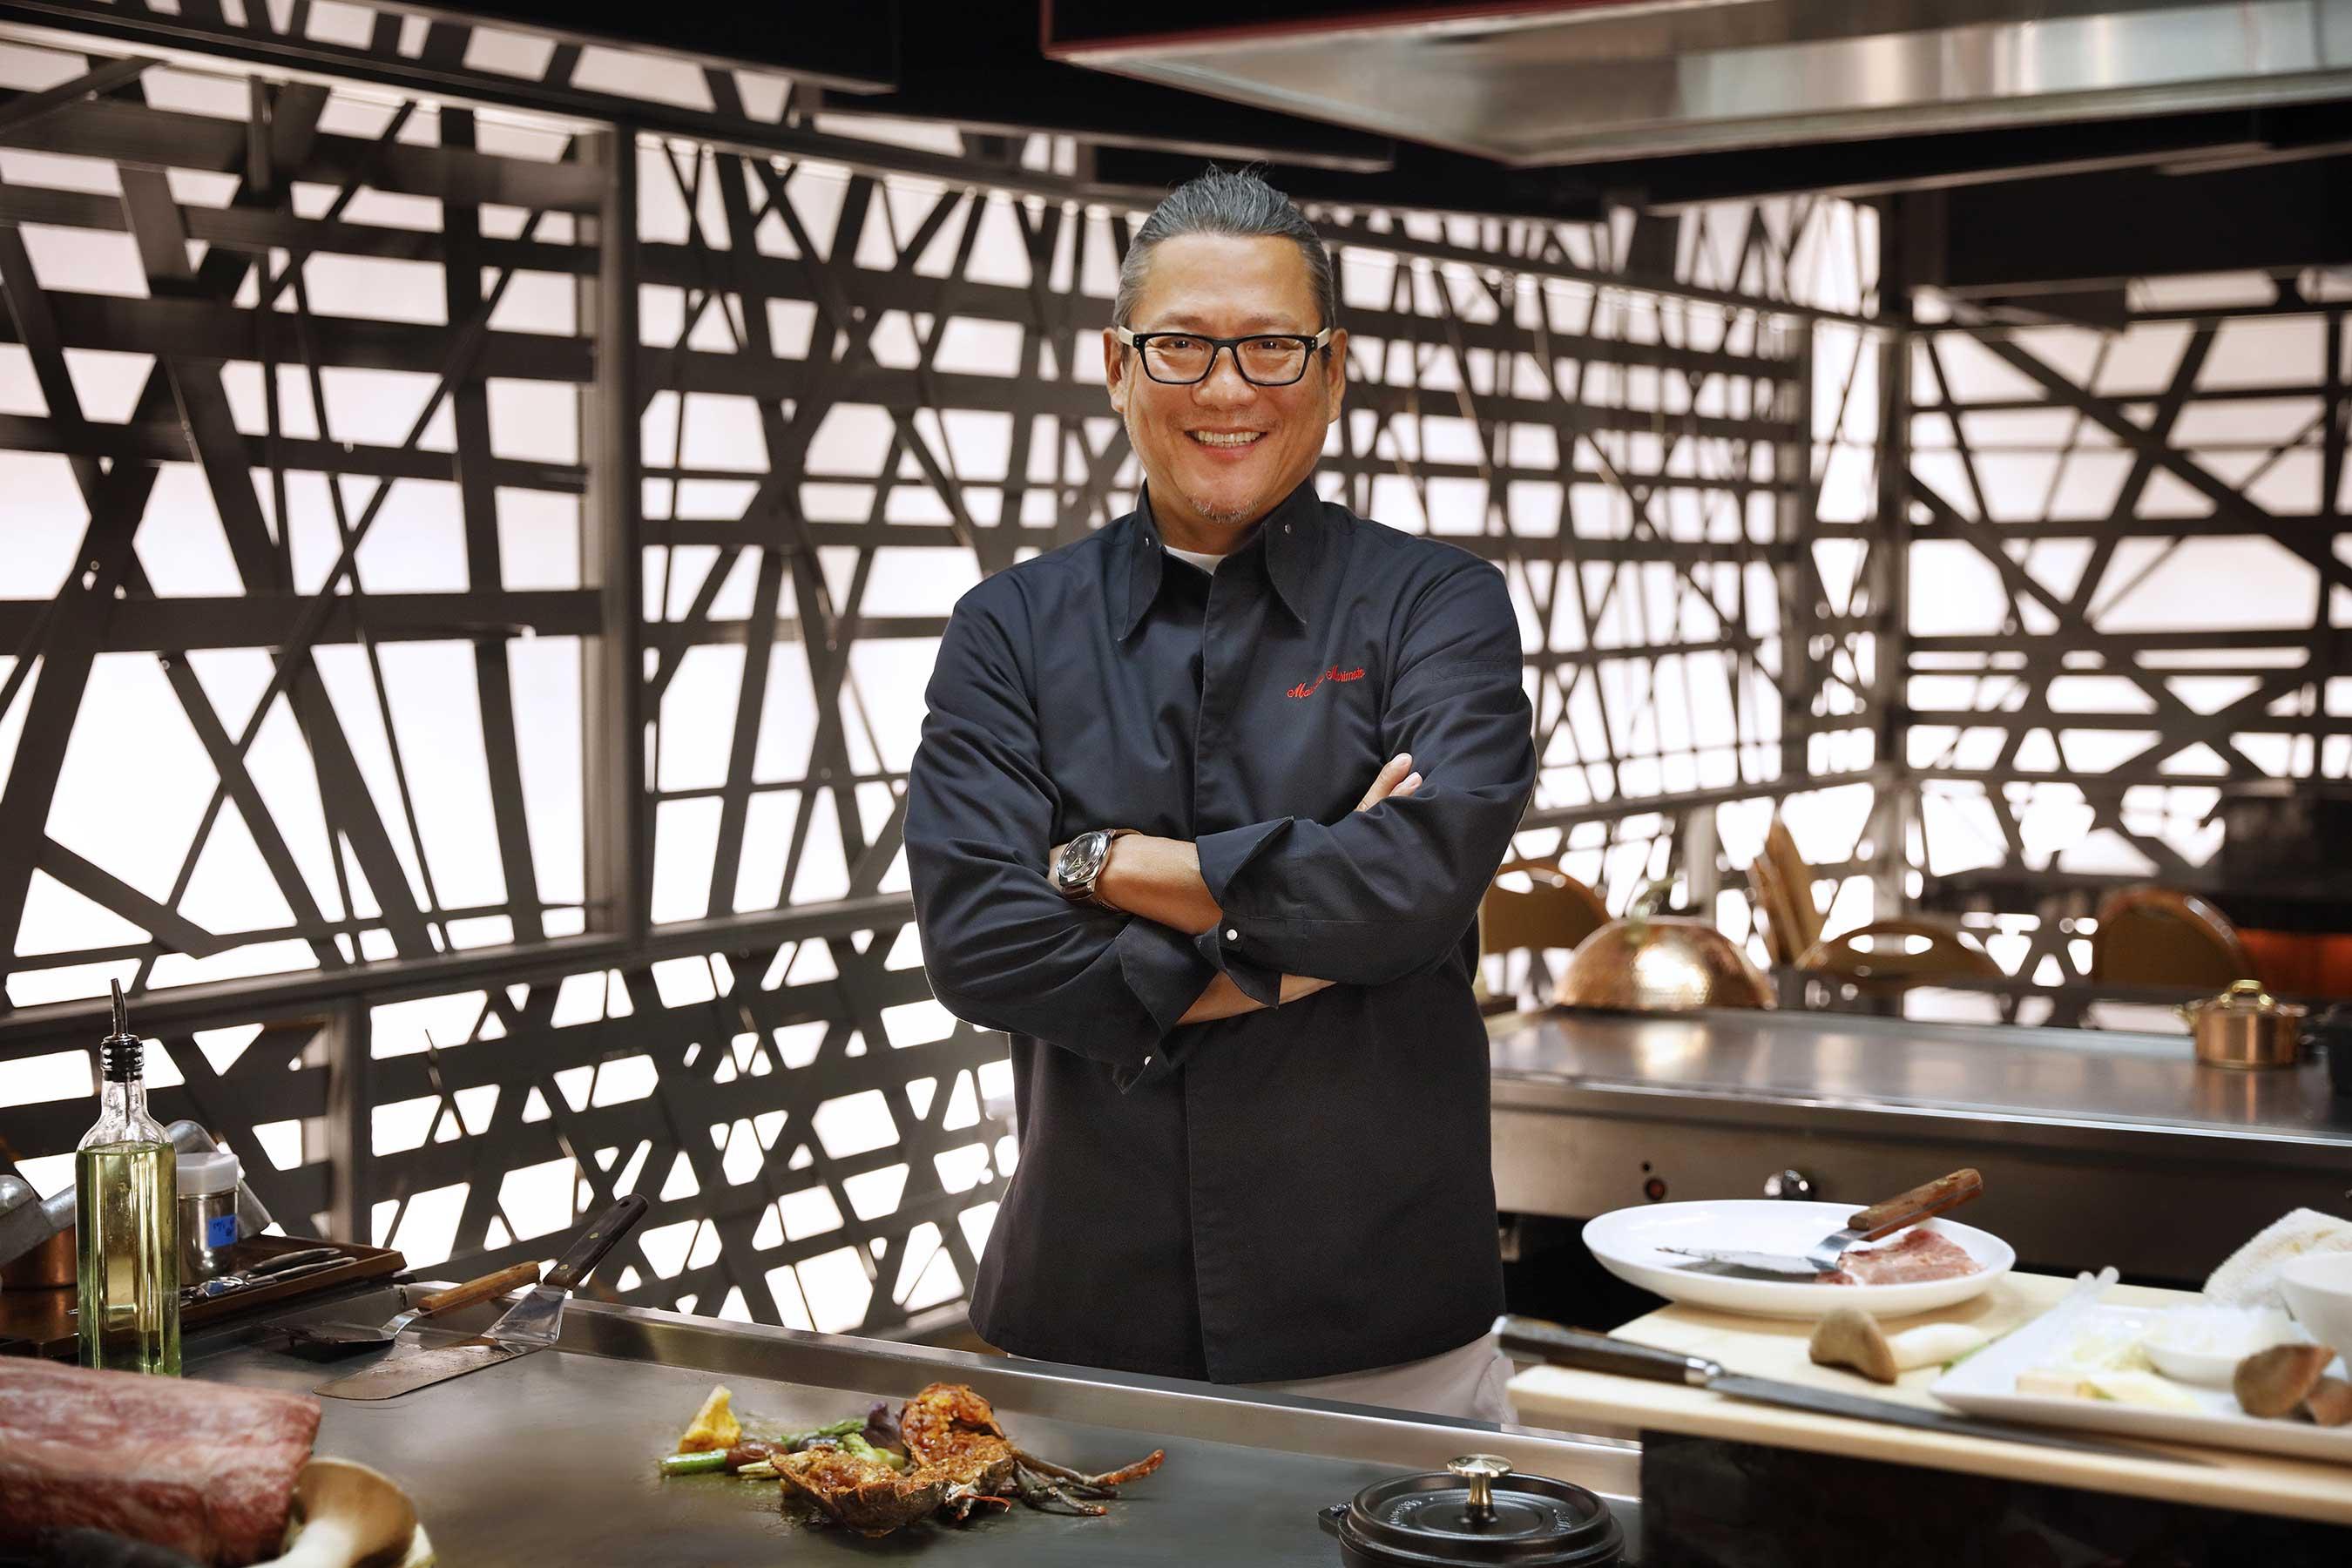 Food Network Star Chef Morimoto Opens Las Vegas Restaurant